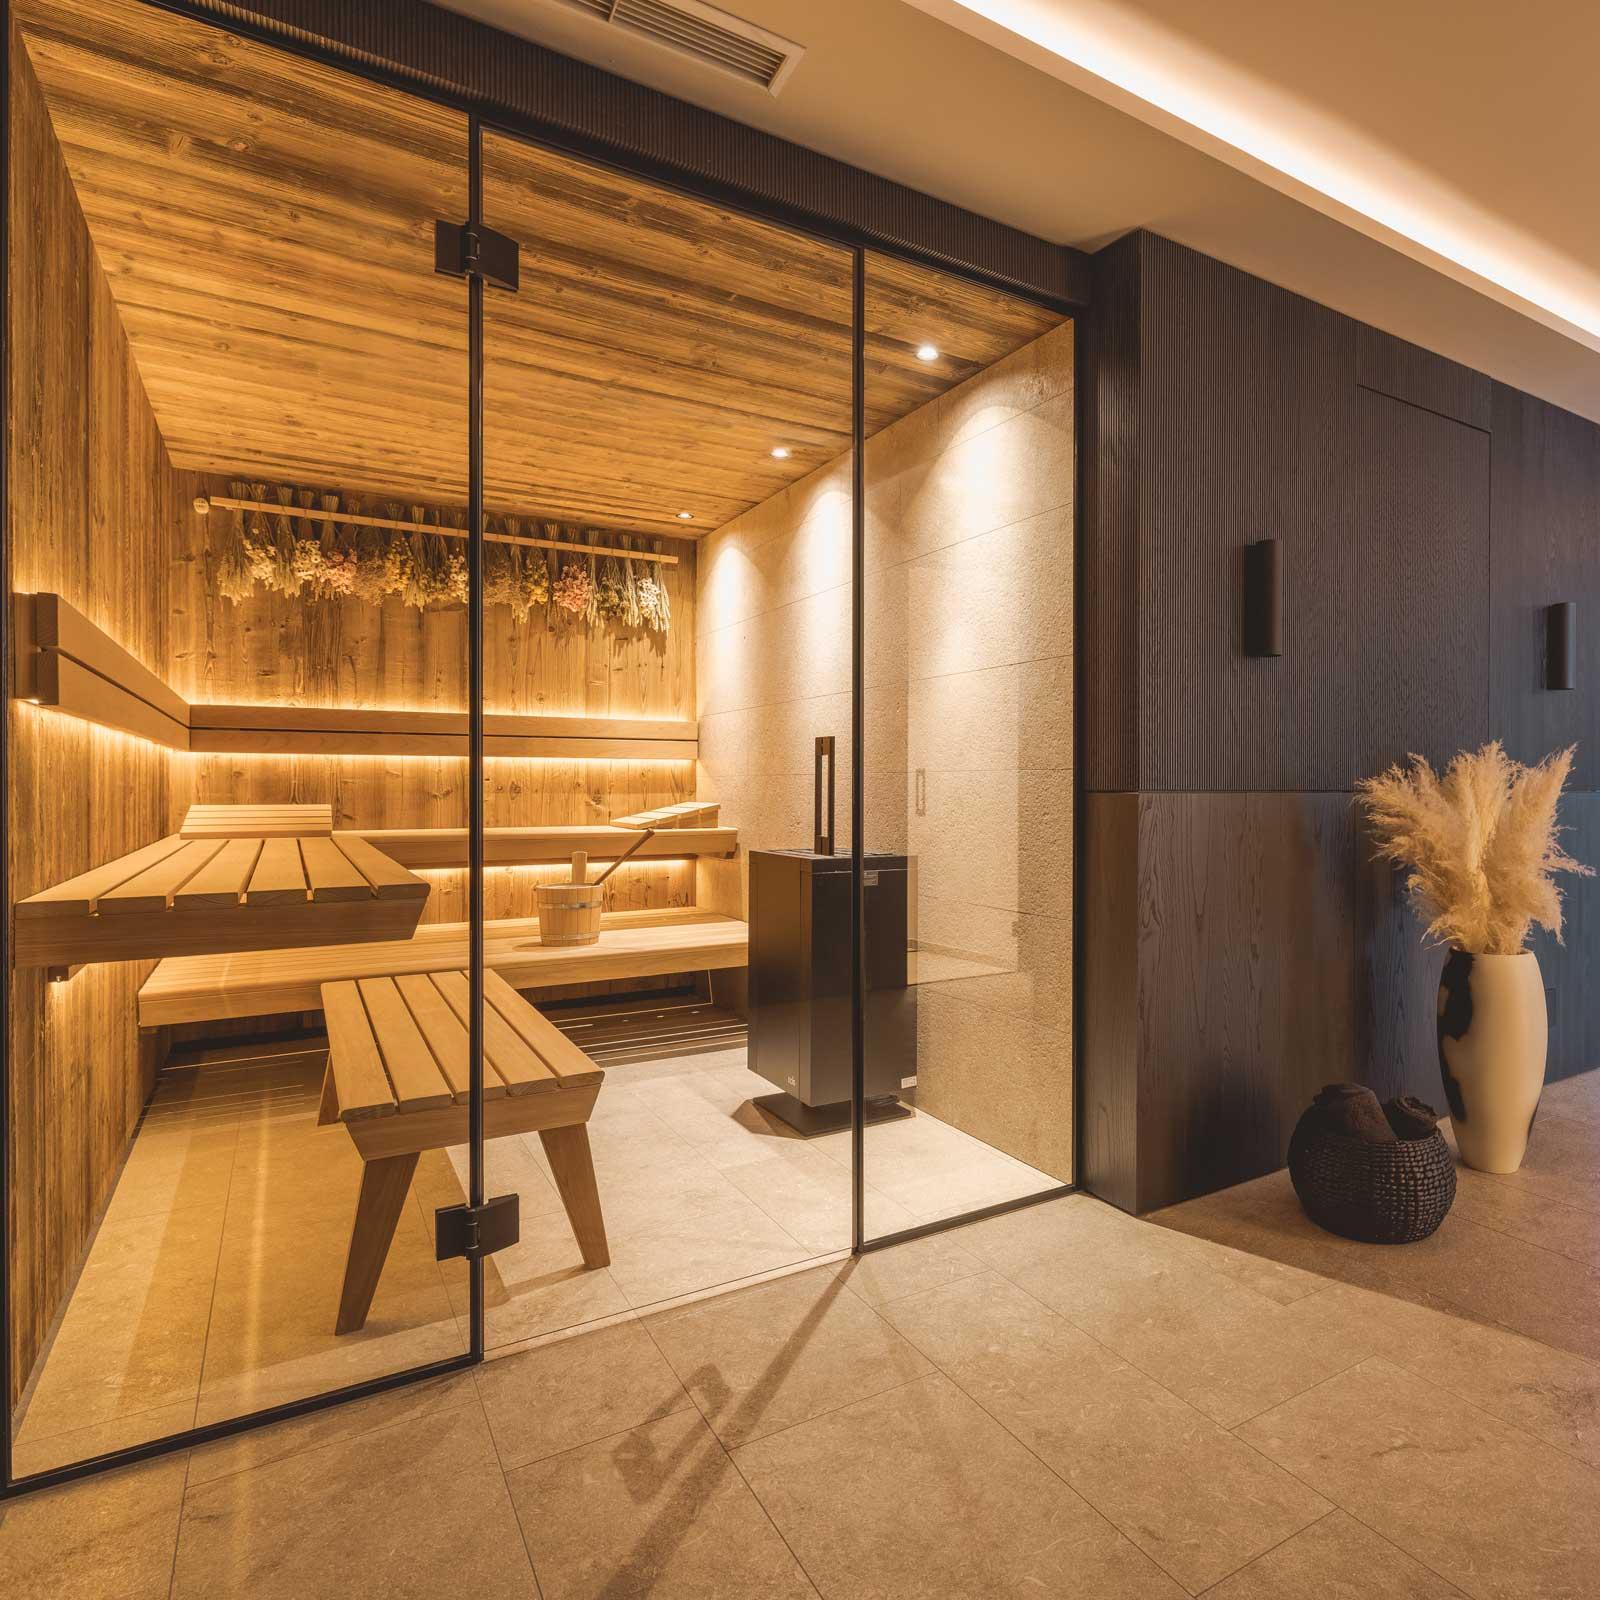 fineheat referenz sauna altholz wellness